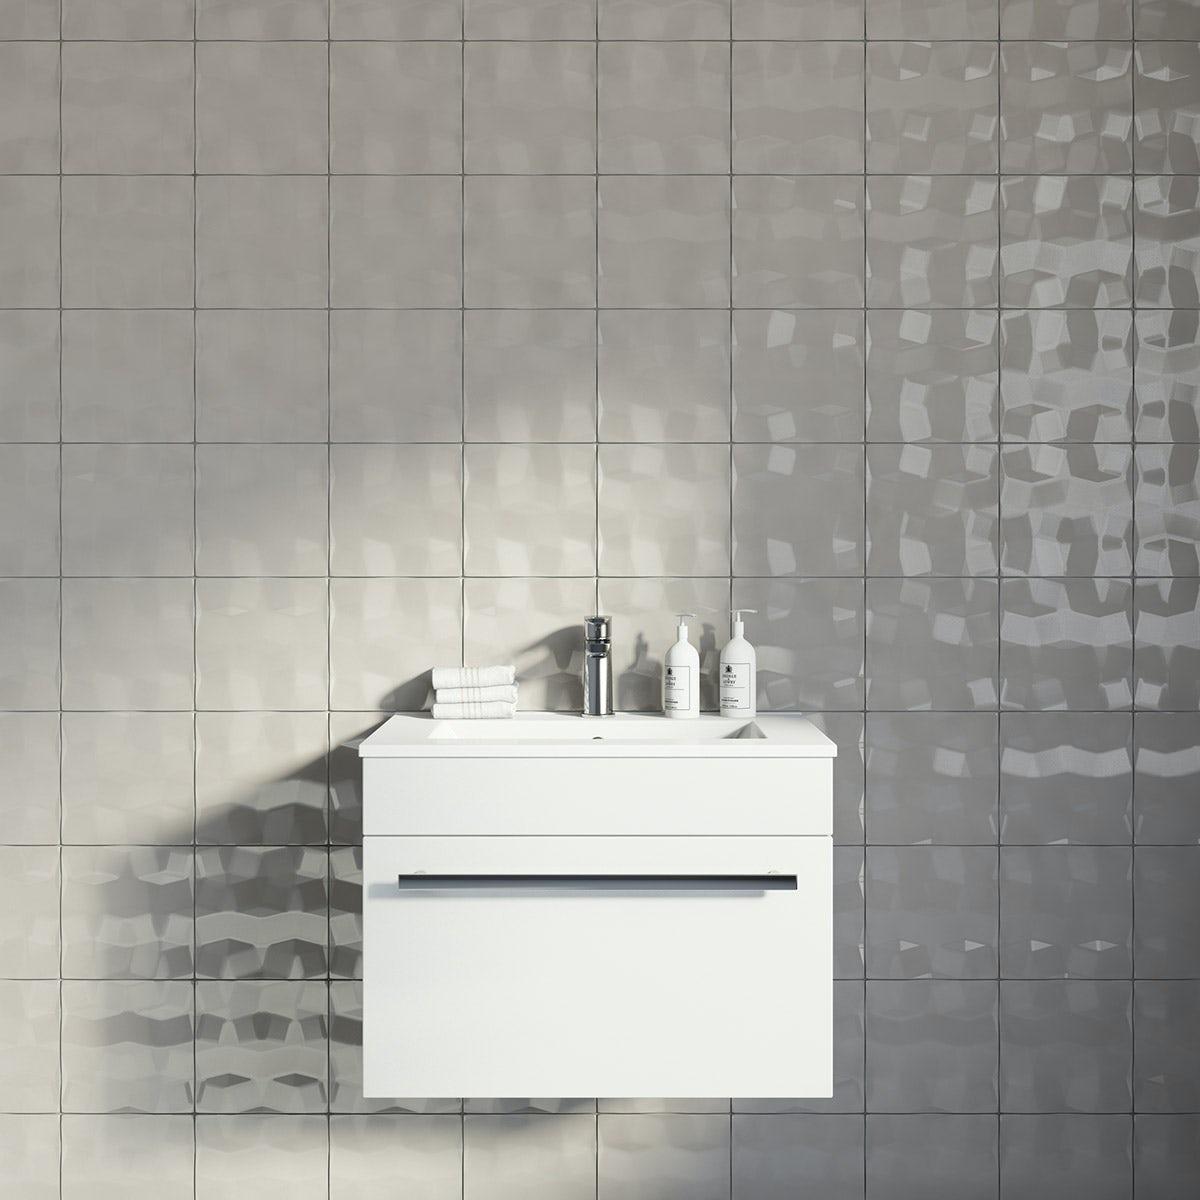 Studio Conran Facet Putty Gloss Tile 198mm x 198mm VictoriaPlumcom